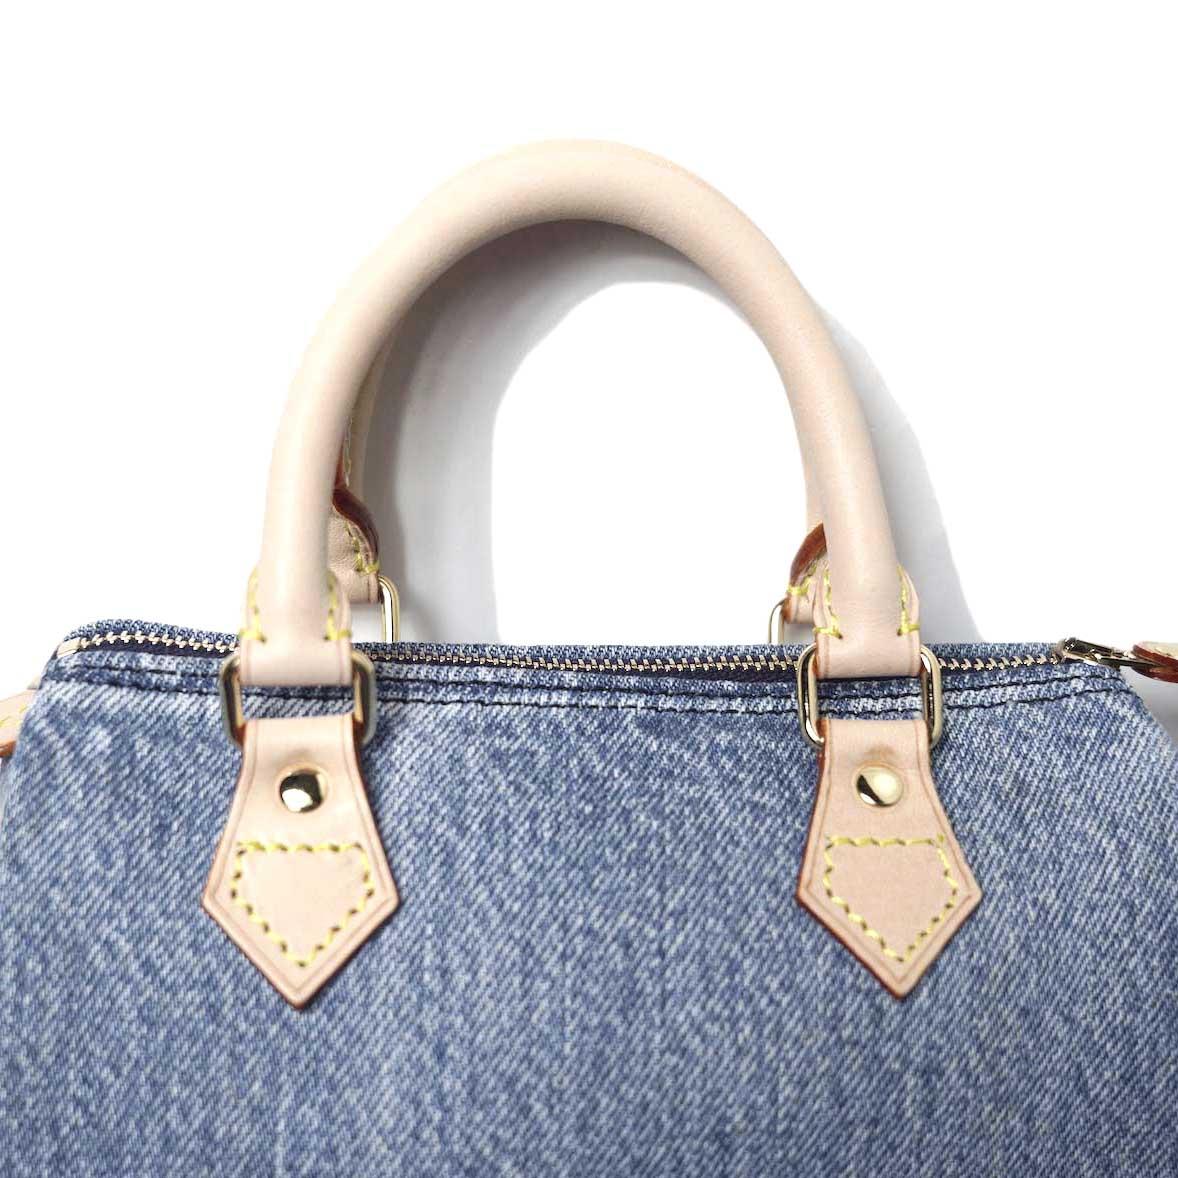 UNUSED / UH0559 Denim Shoulder Bag (indido) 持ち手アップ